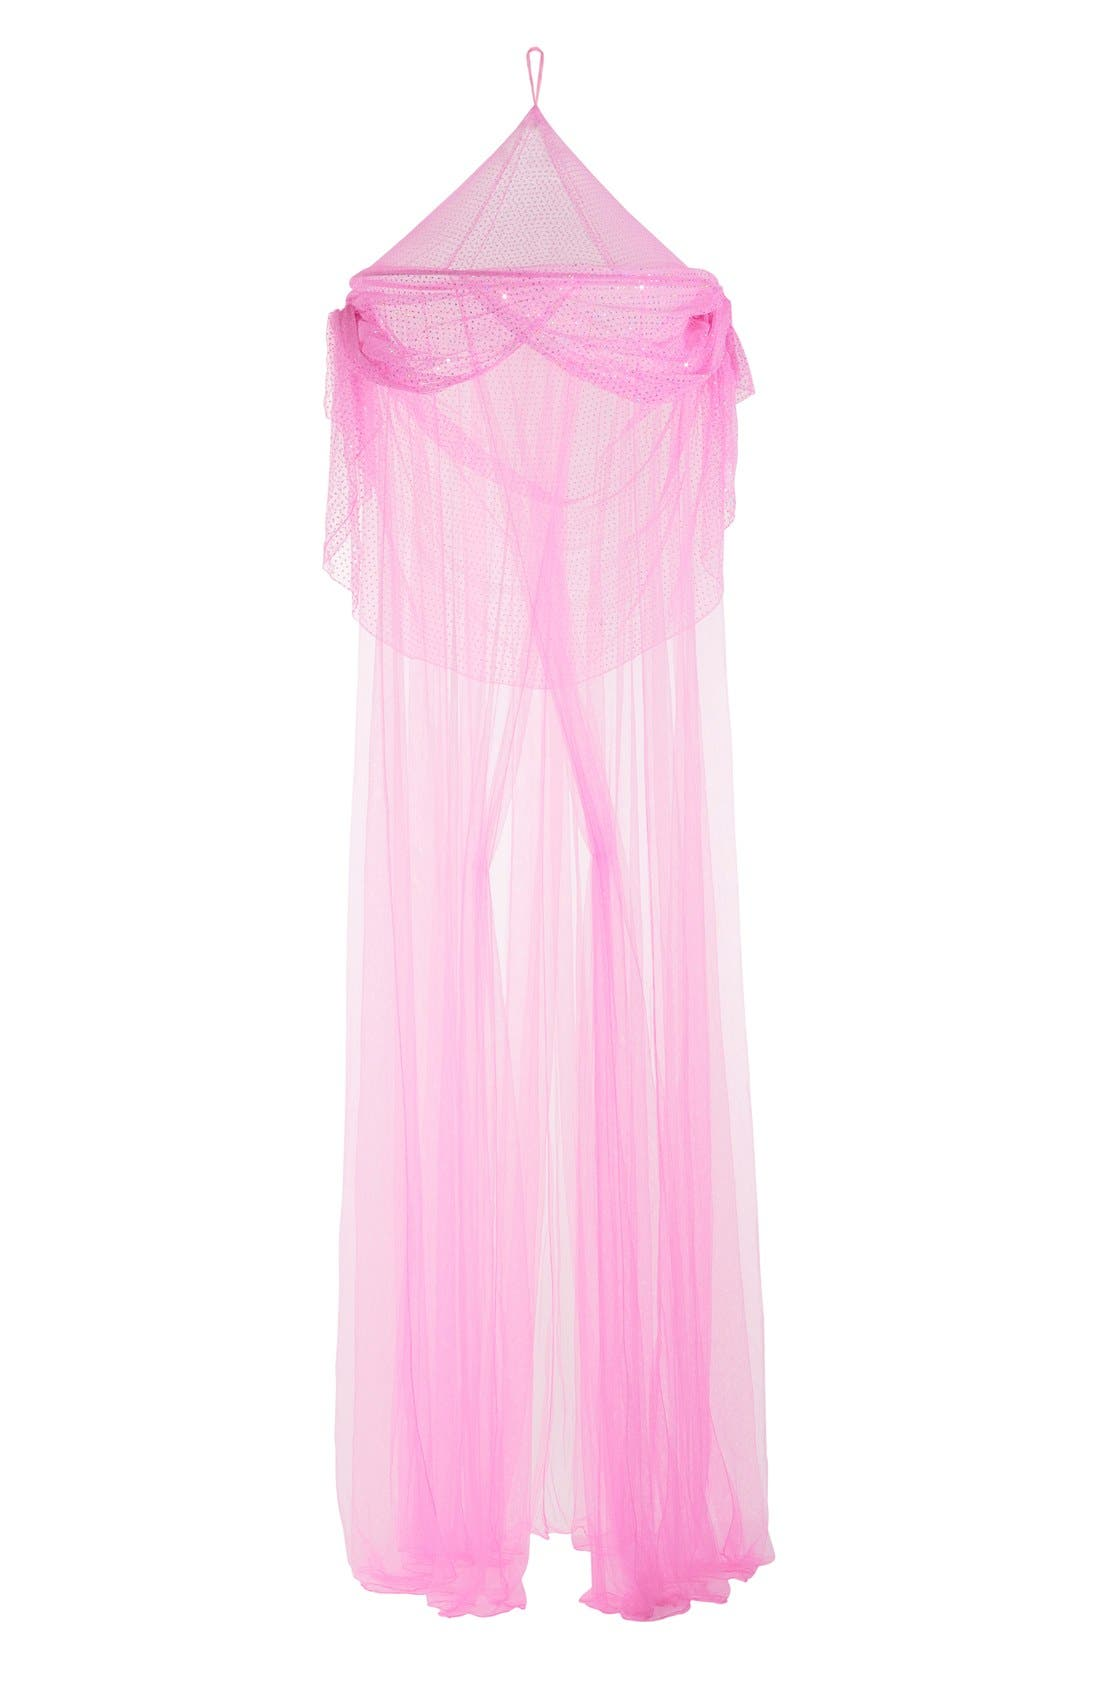 3C4G 'Pink SparkleTastic' Bed Canopy